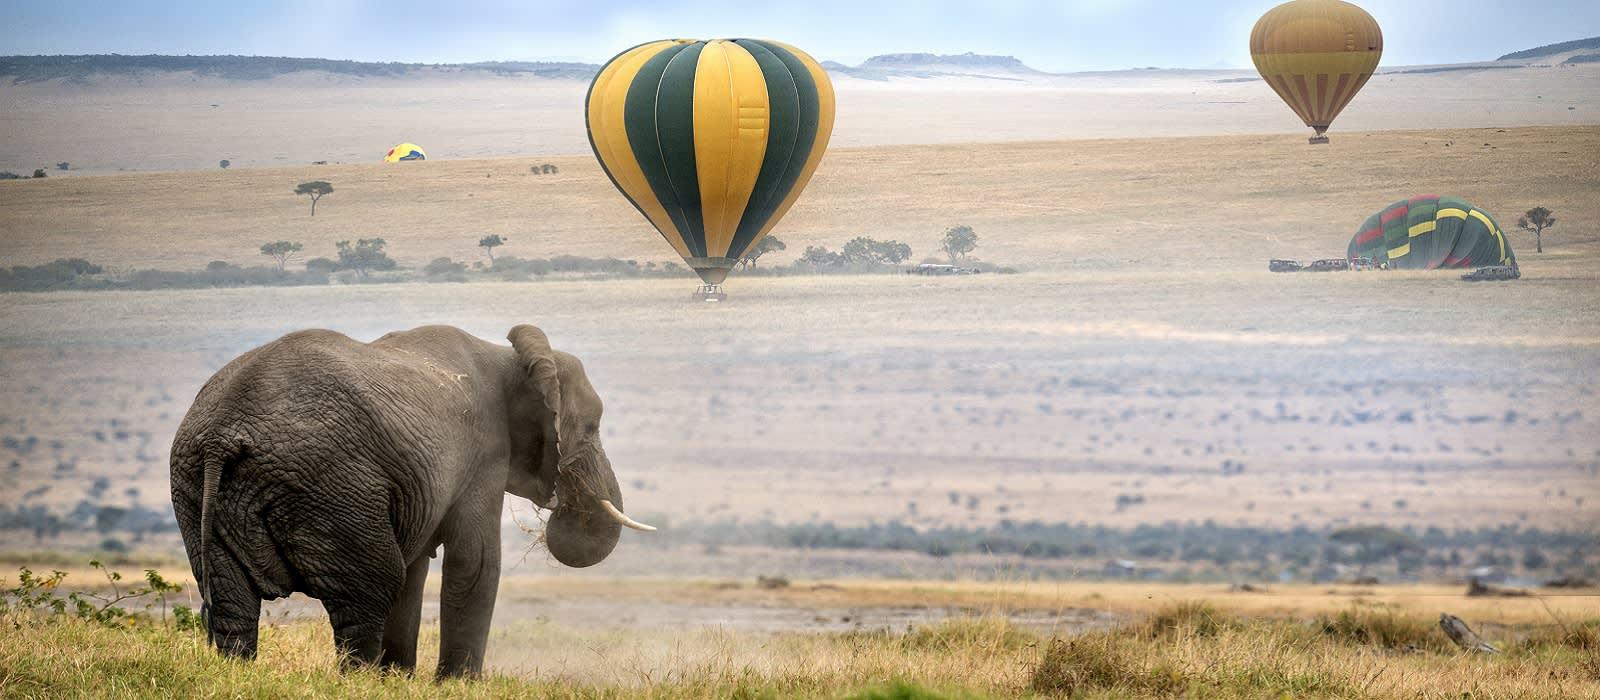 Enchanting Travels Africa Tours elephant , foggy morning, hot air balloons landing on background, Masai Mara National Reserve, Kenya